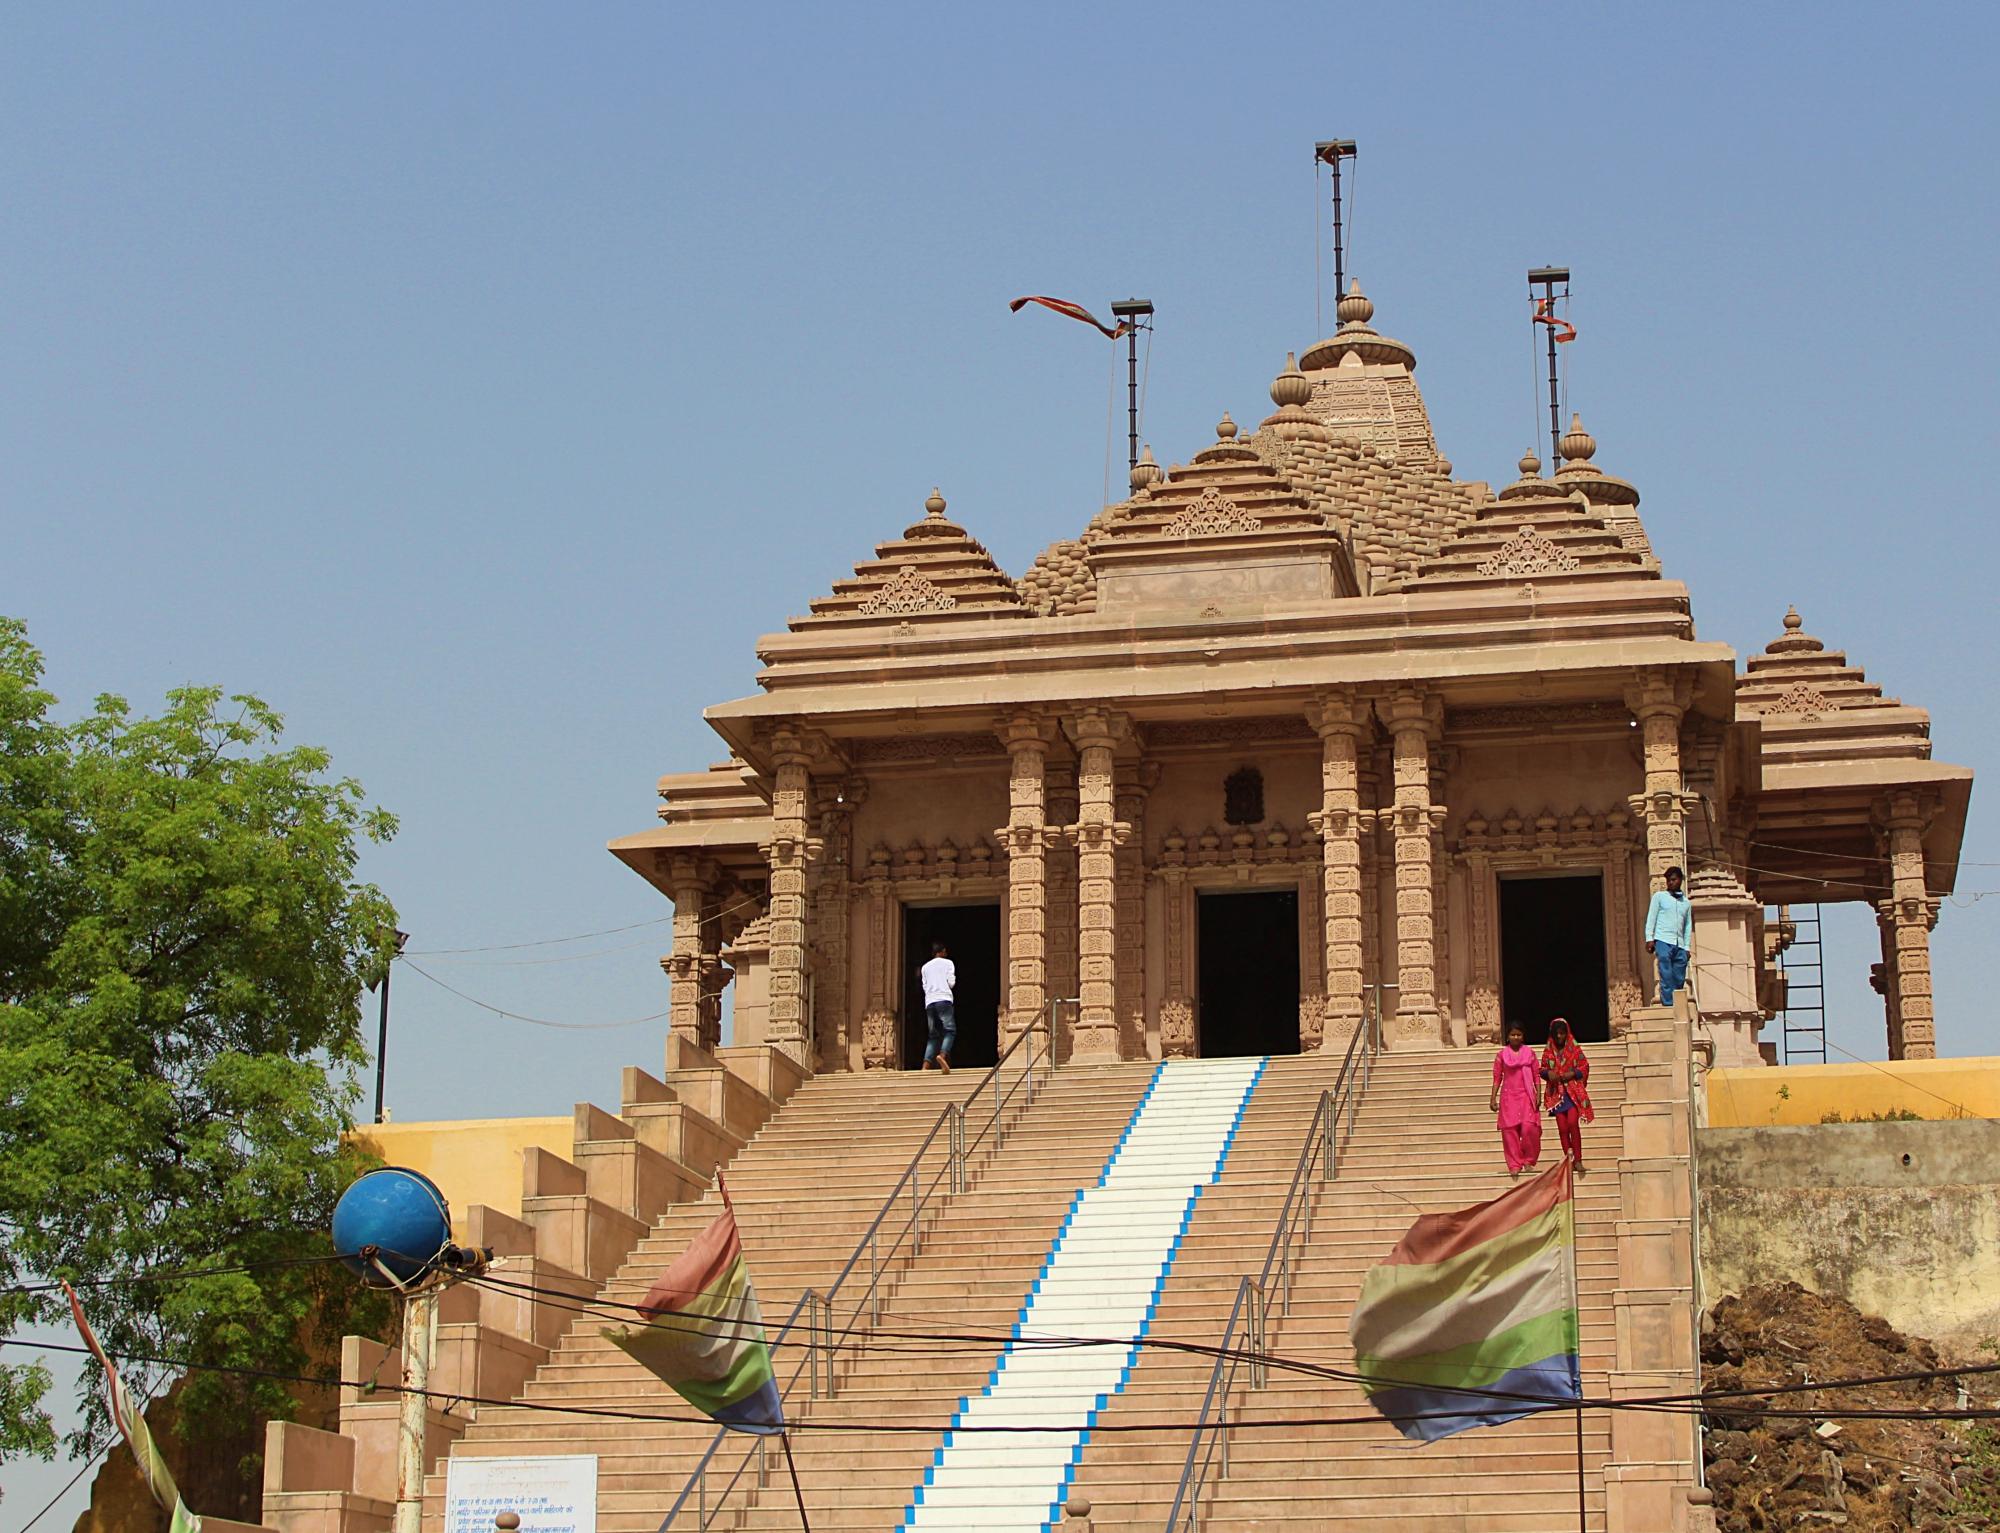 Mahaveer Giri Jain Temple